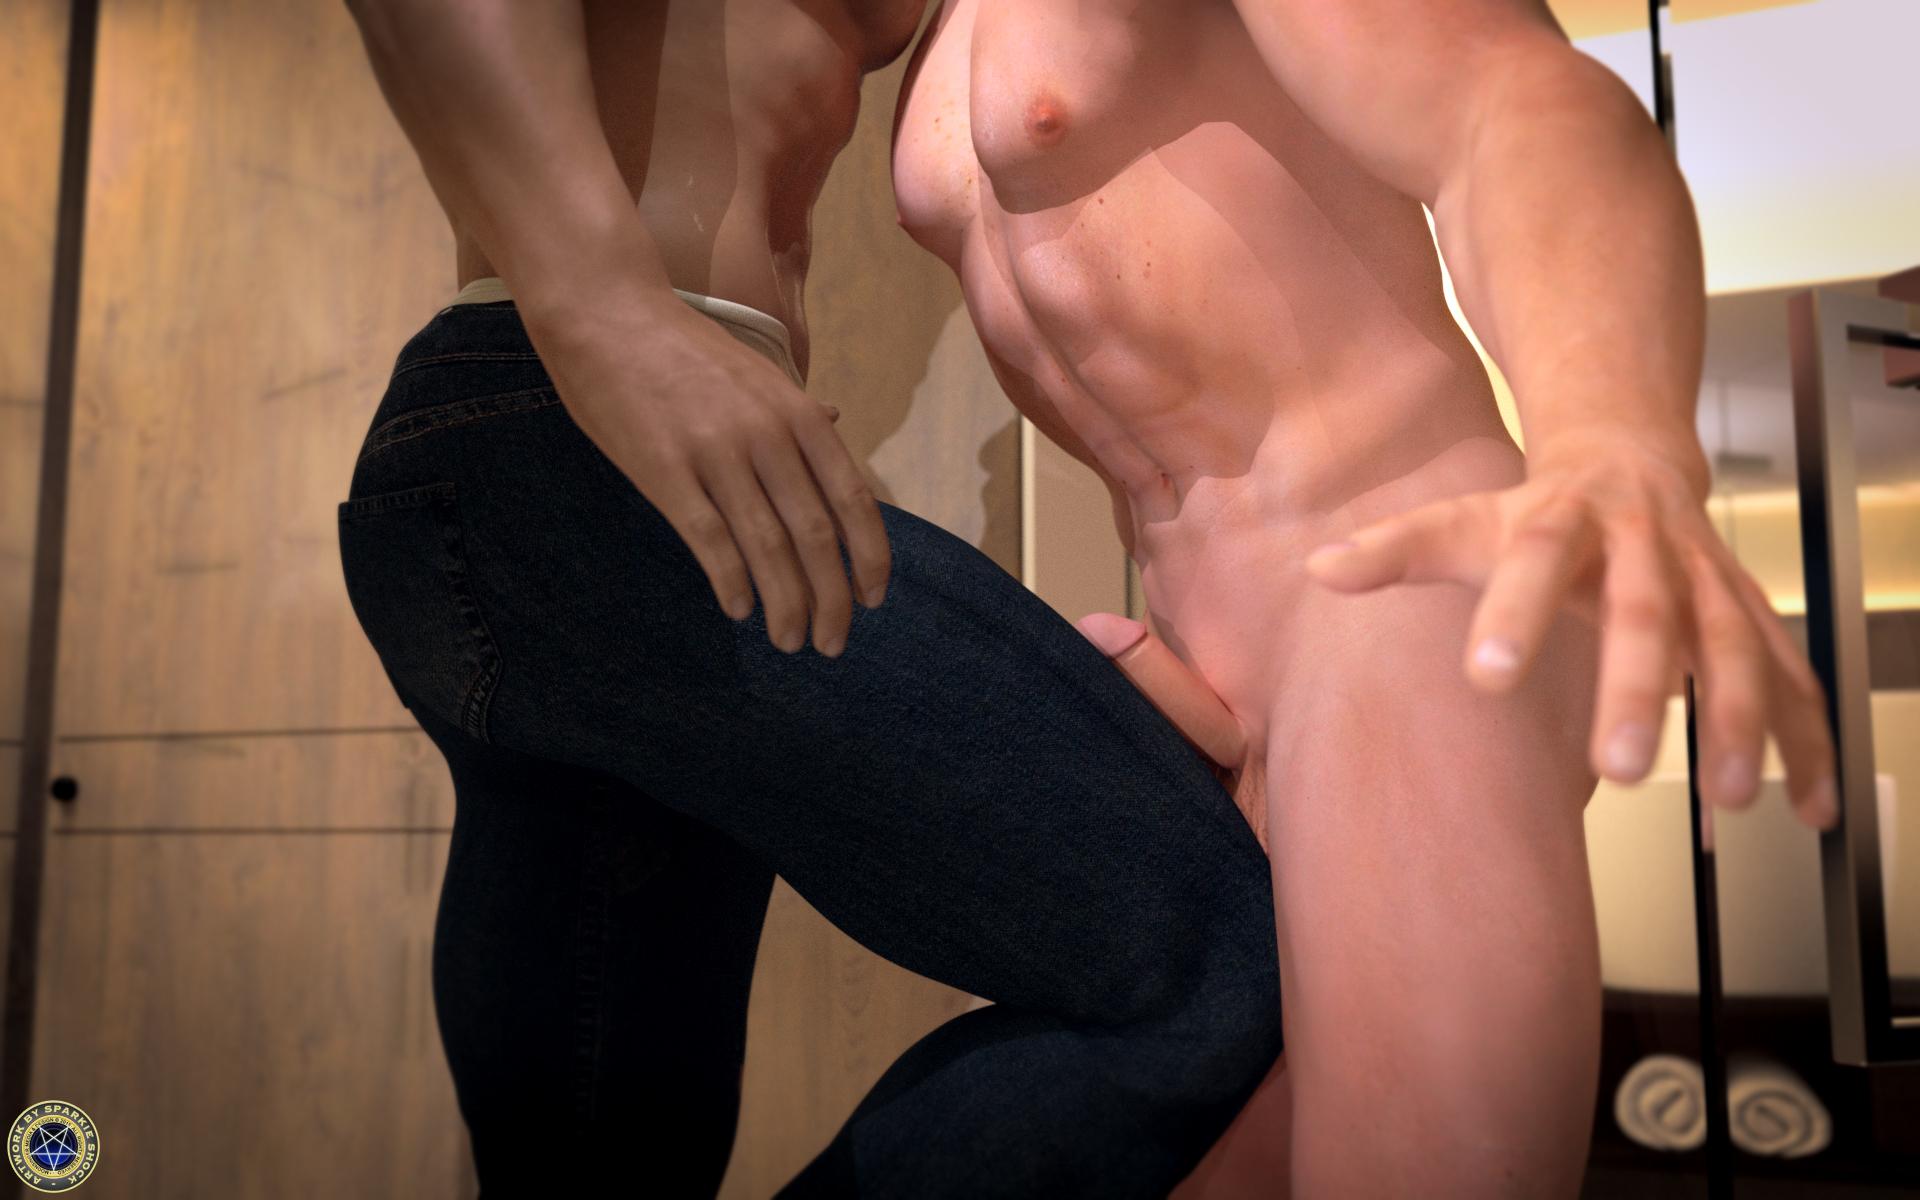 porn in a gym